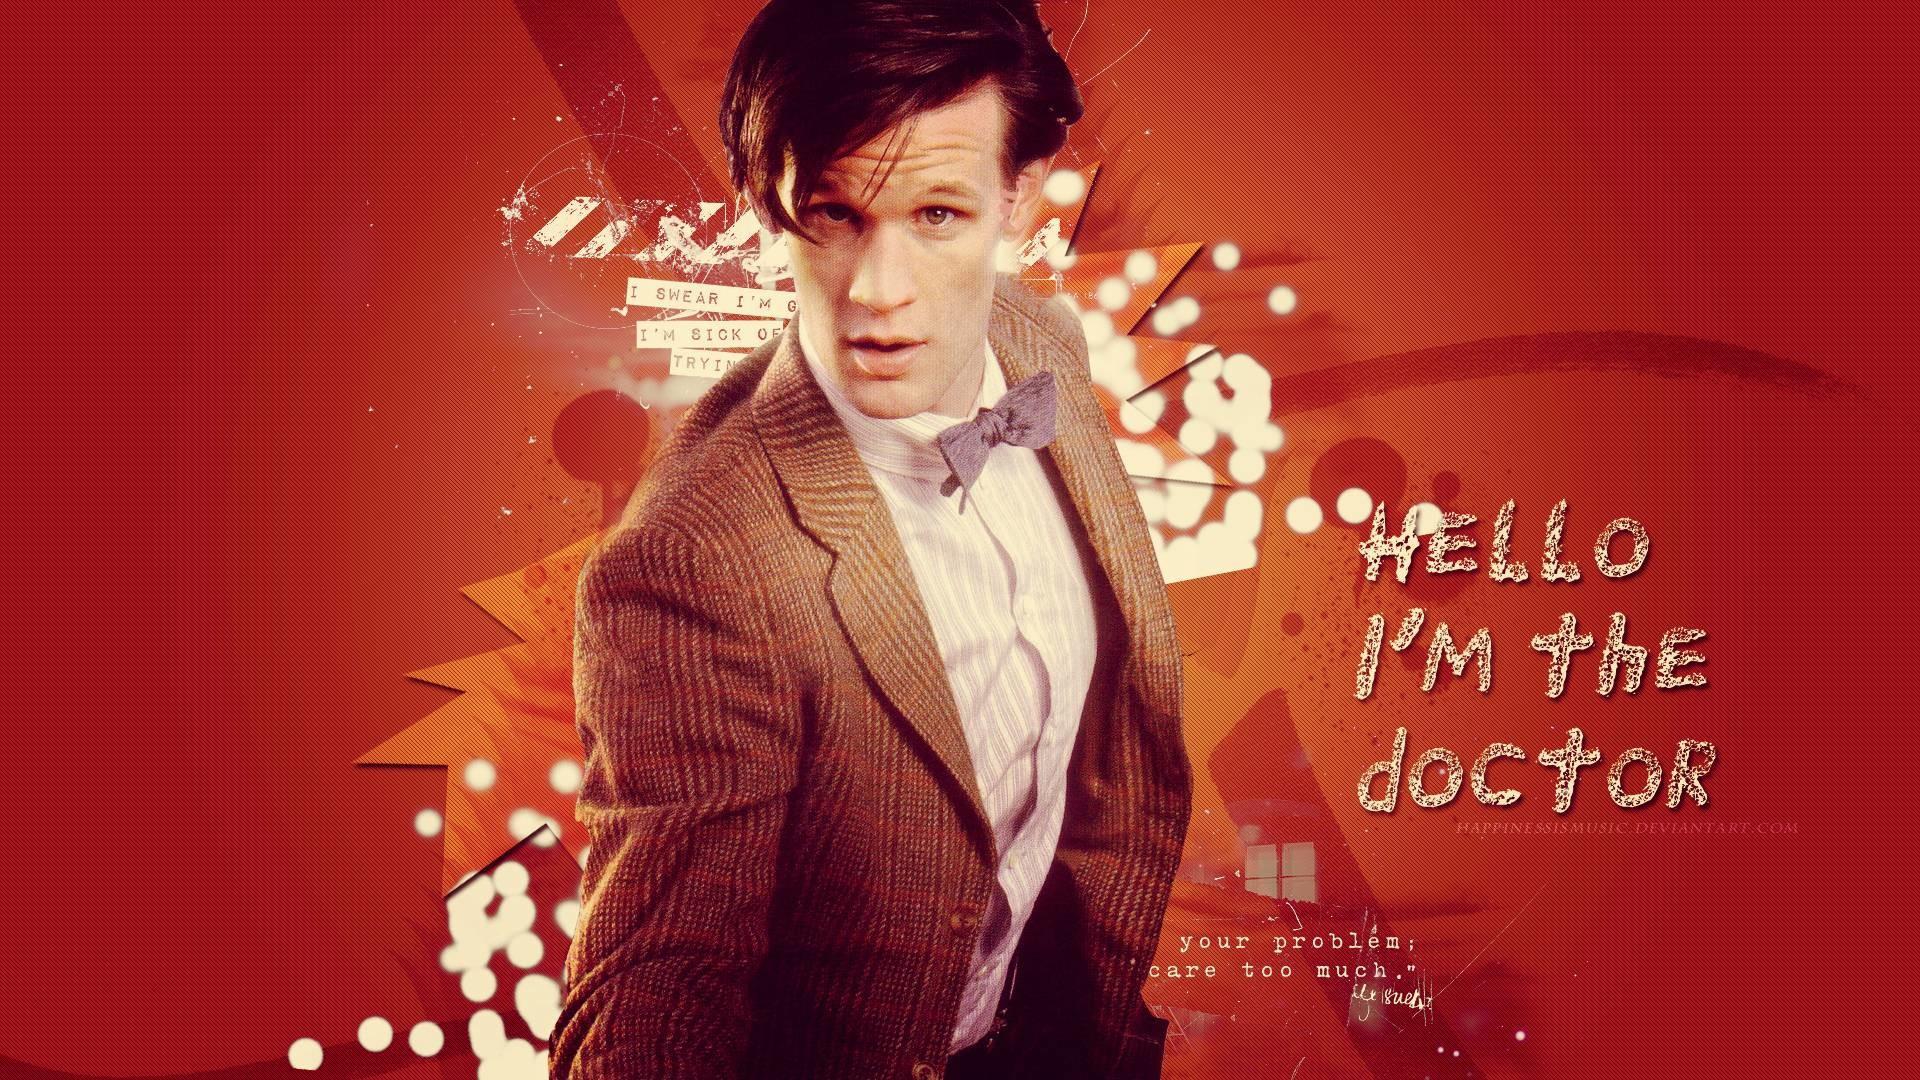 Eleventh Doctor Wallpaper 71 Images